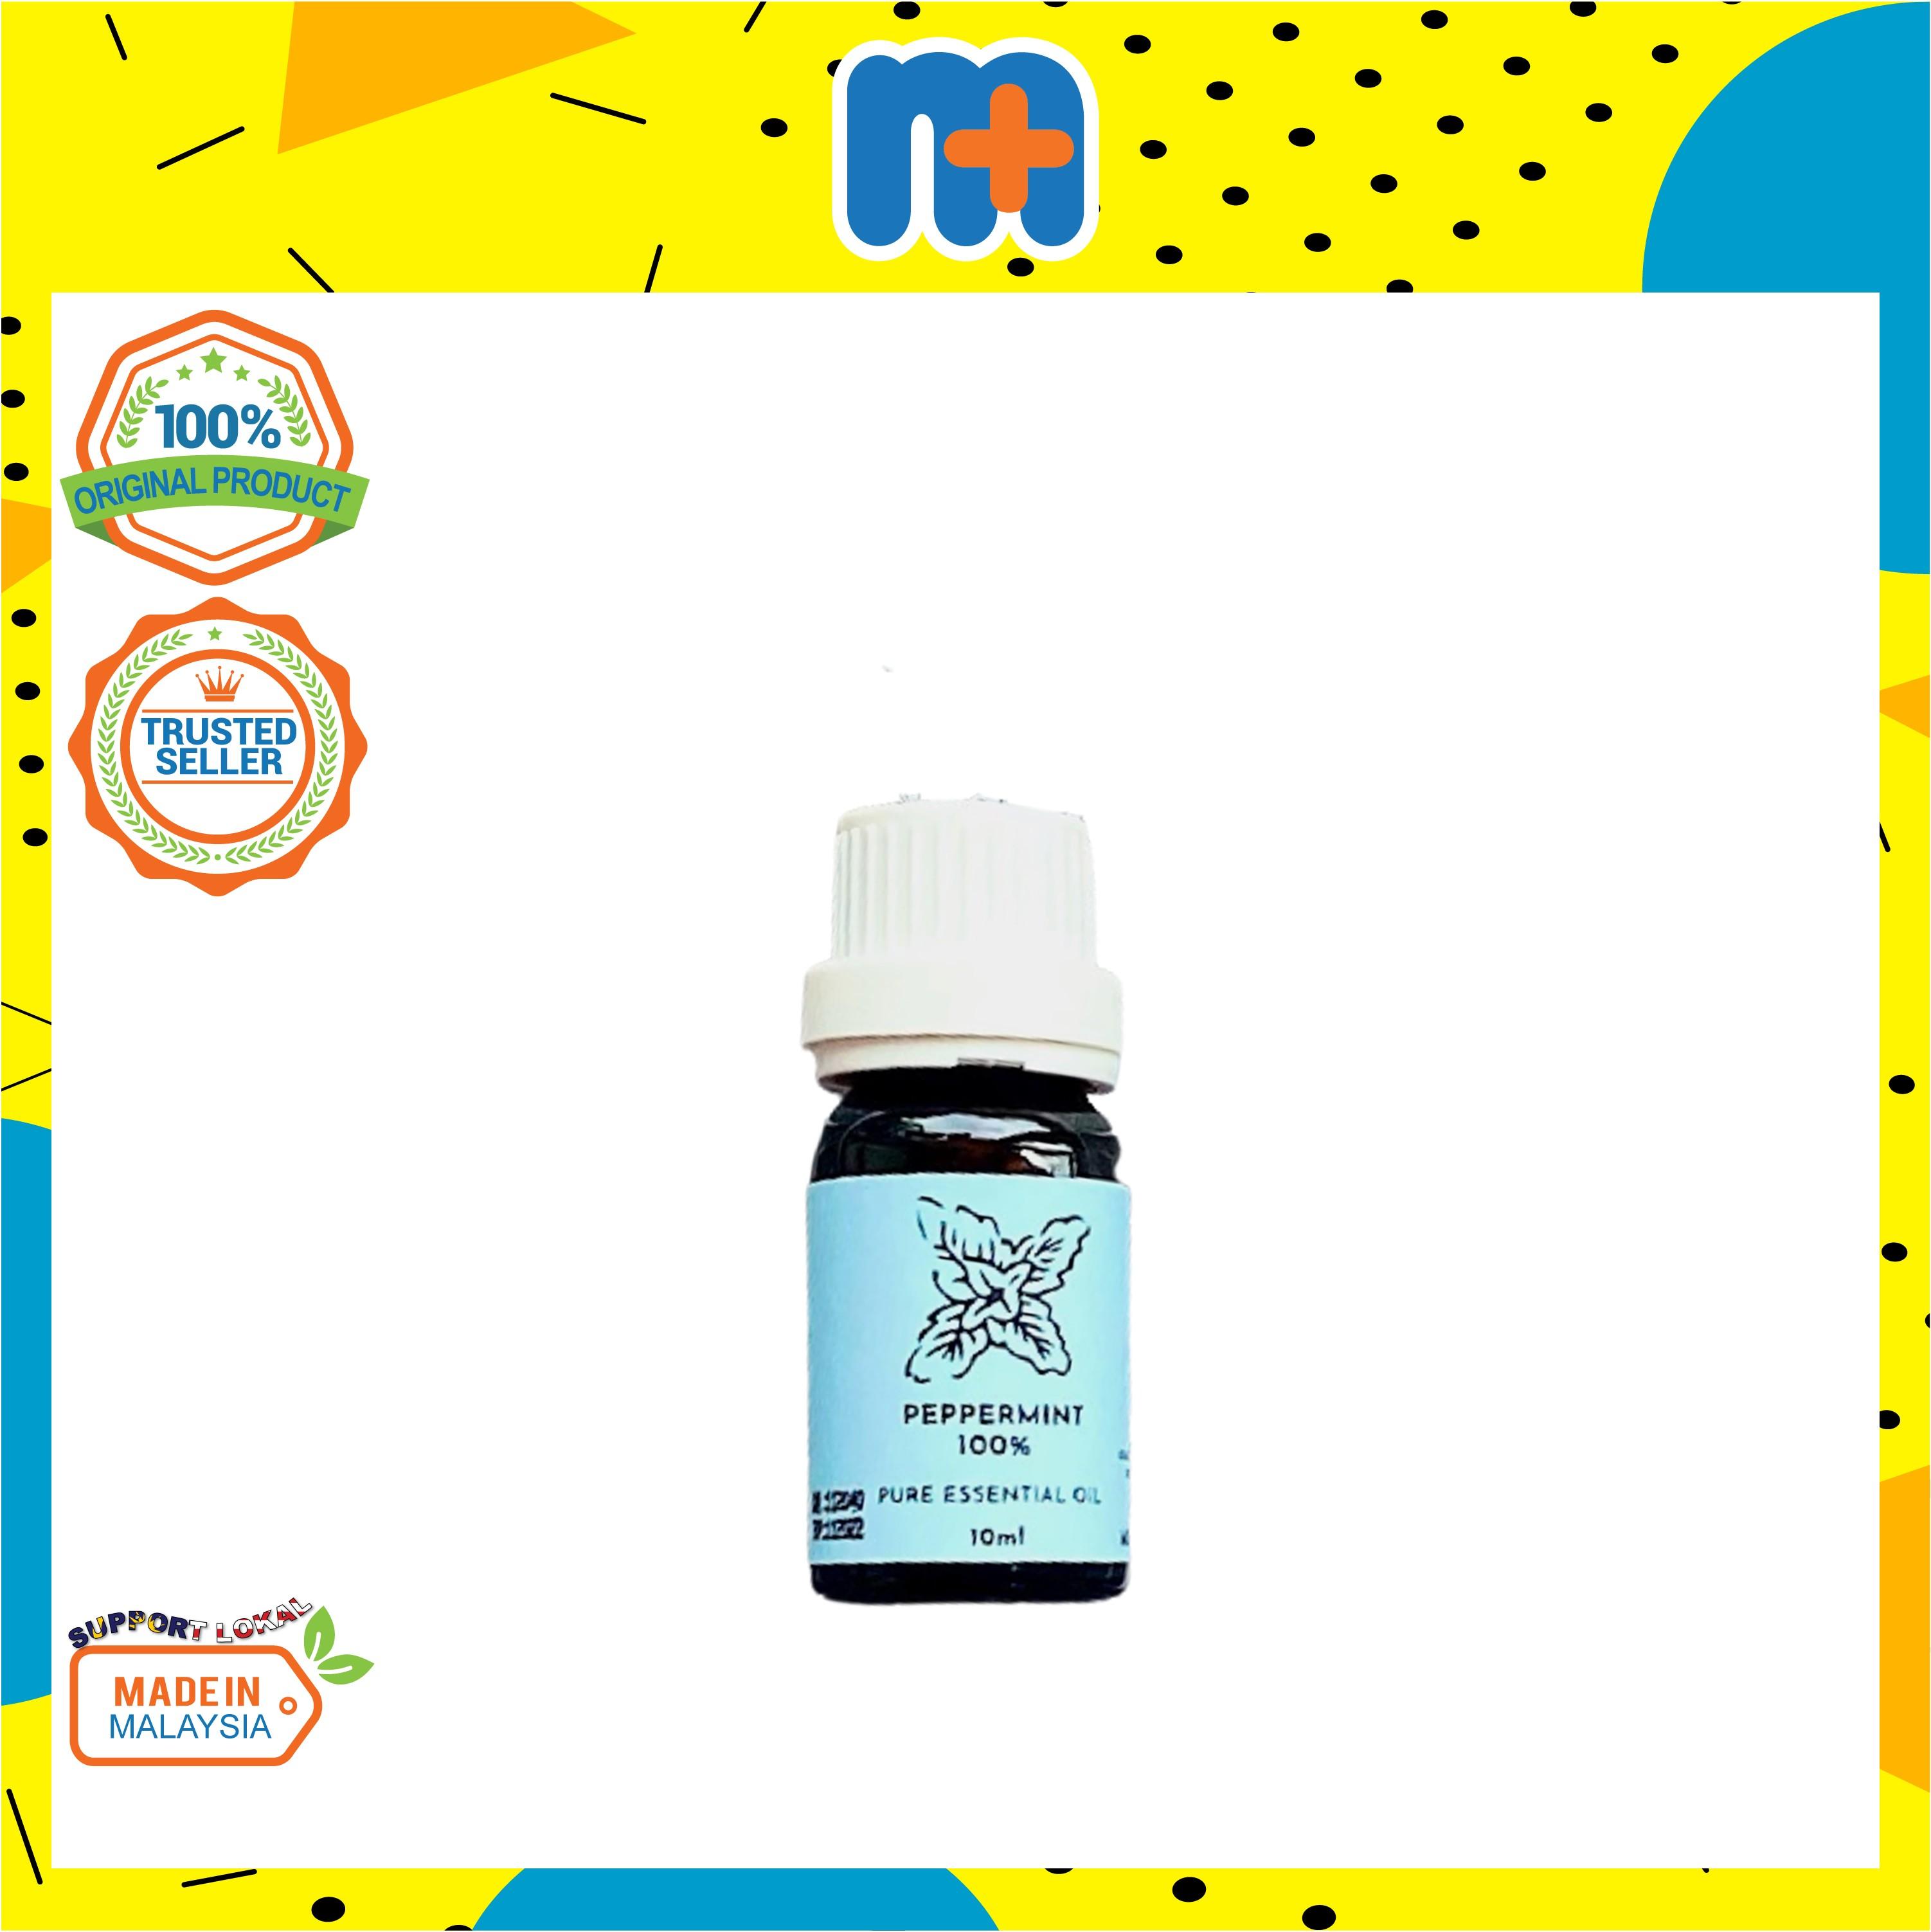 [MPLUS] PLANTSENSE Peppermint 100% Pure Essential Oil 10ml